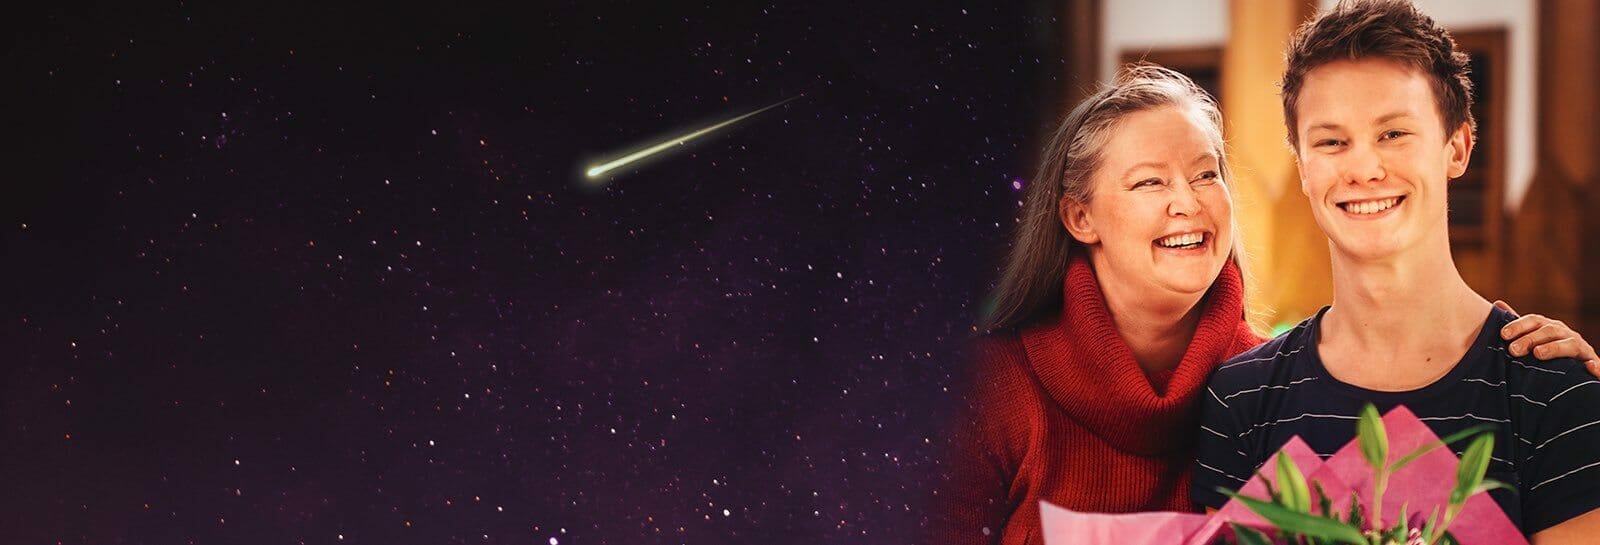 Skolarets-komet2_desktop_aboutus